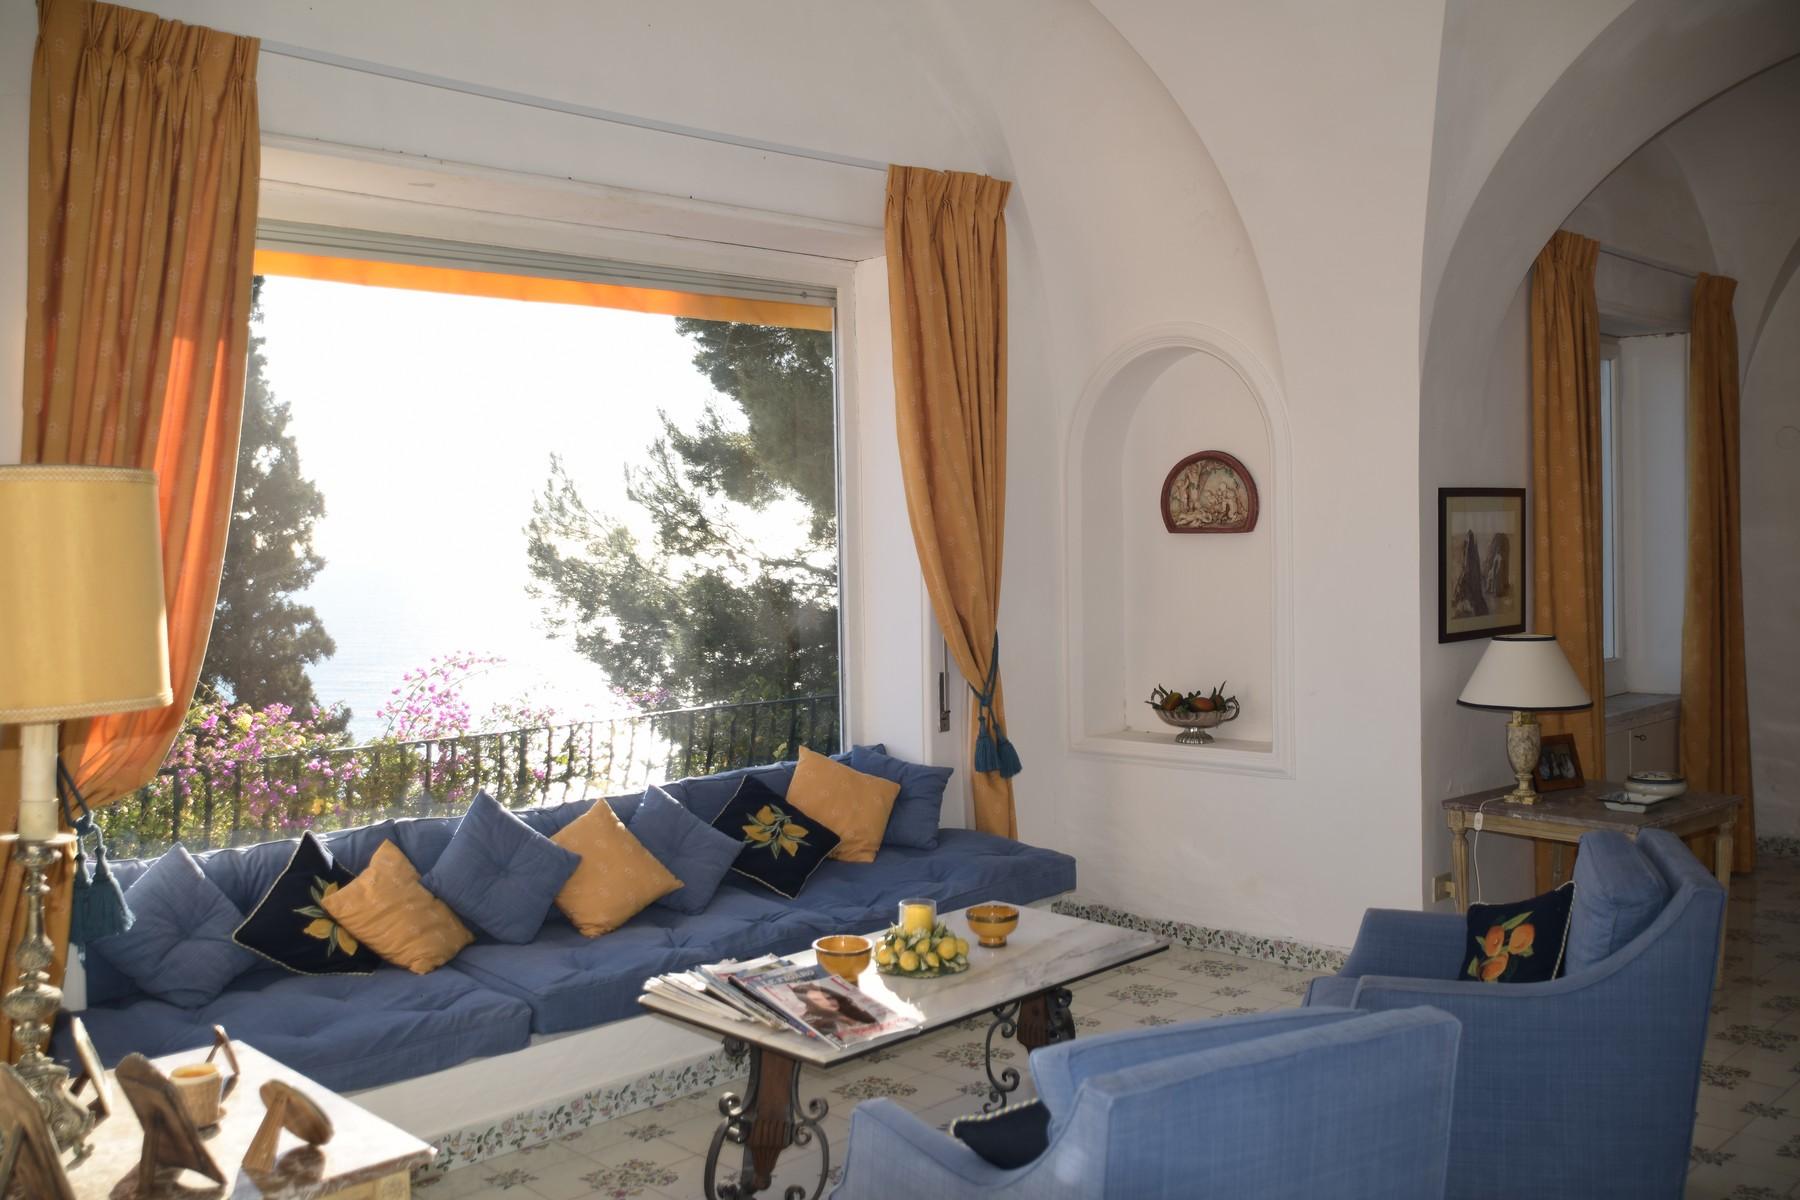 Additional photo for property listing at Beautiful villa in Capri overlooking the Faraglioni Capri, Naples Italy